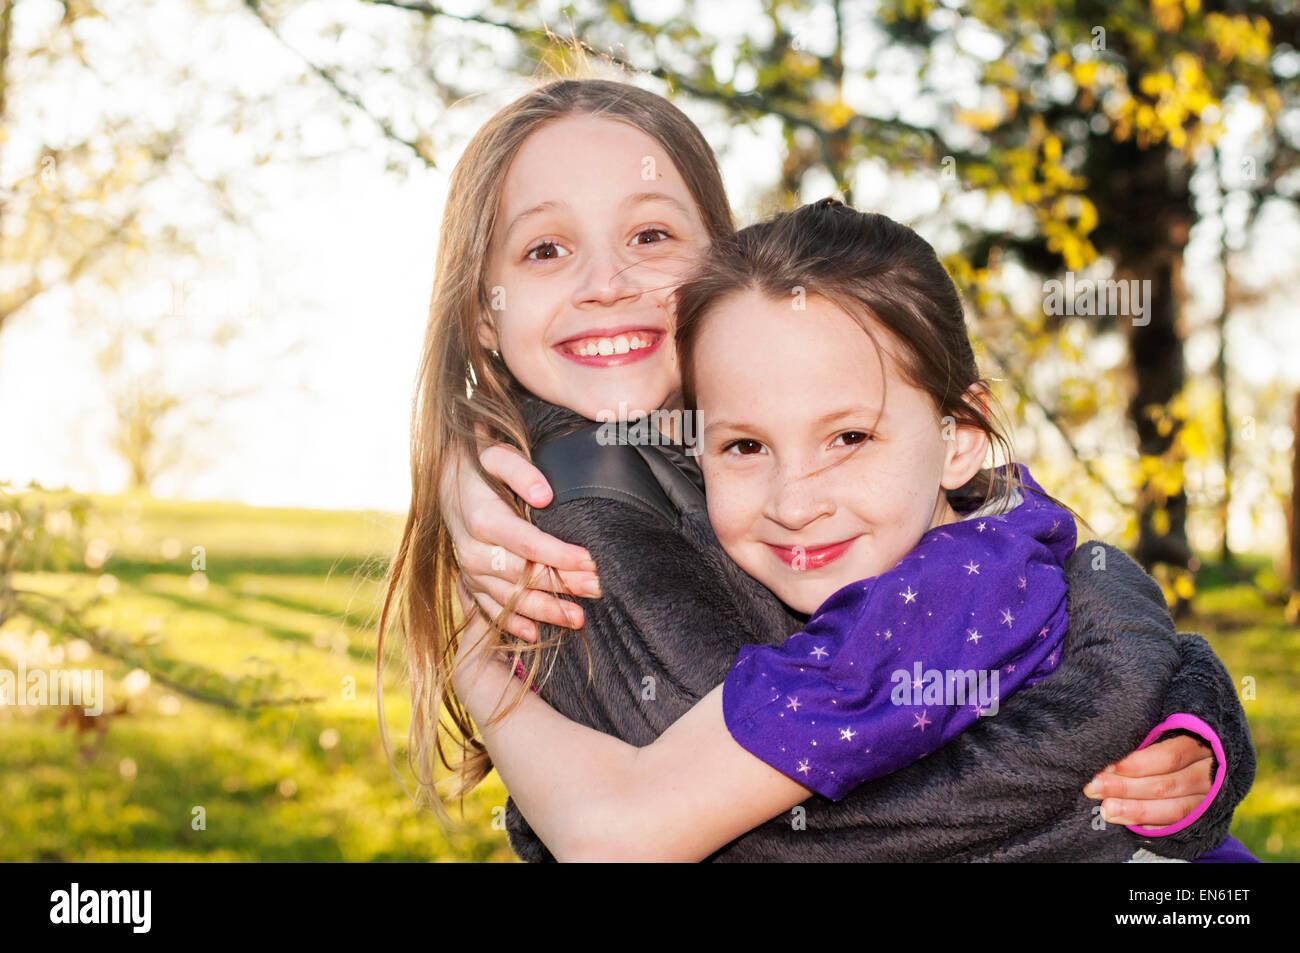 Hermanas sonrisa abrazo Imagen De Stock